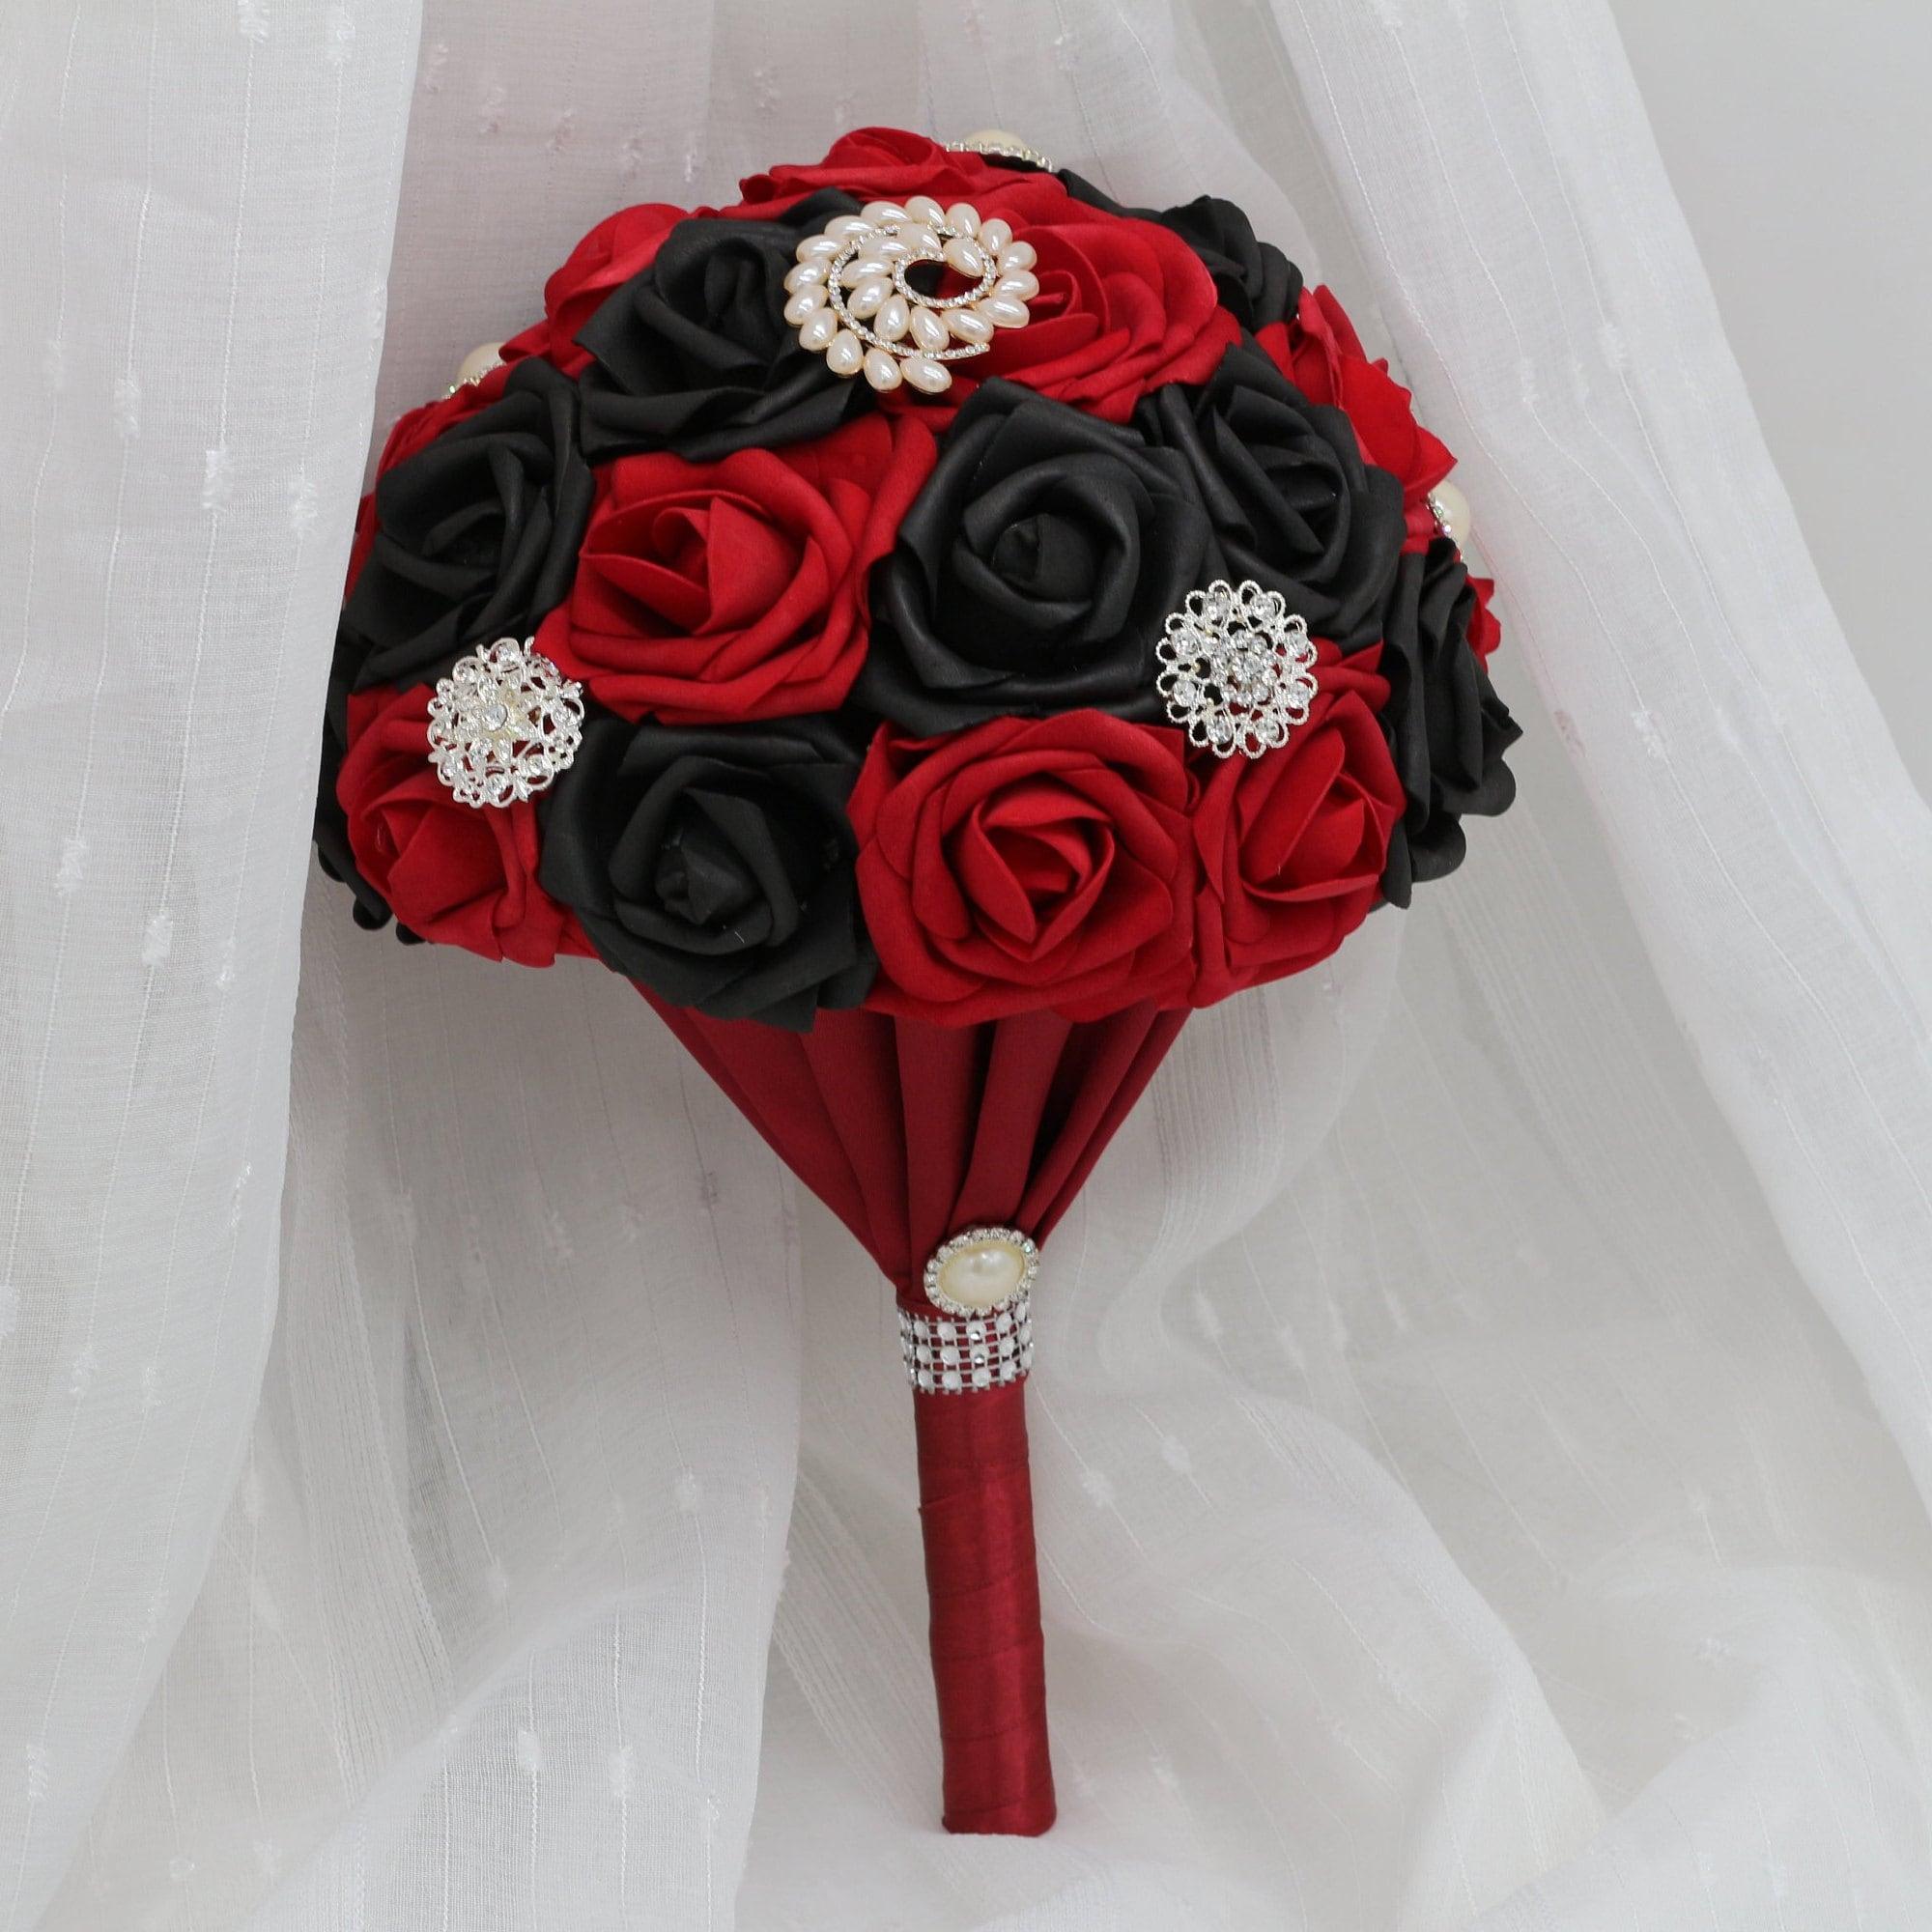 Artificial Flower Bouquet Wedding Bouquet Red Rose Jr Bridesmaid Bouquet Real Touch Roses